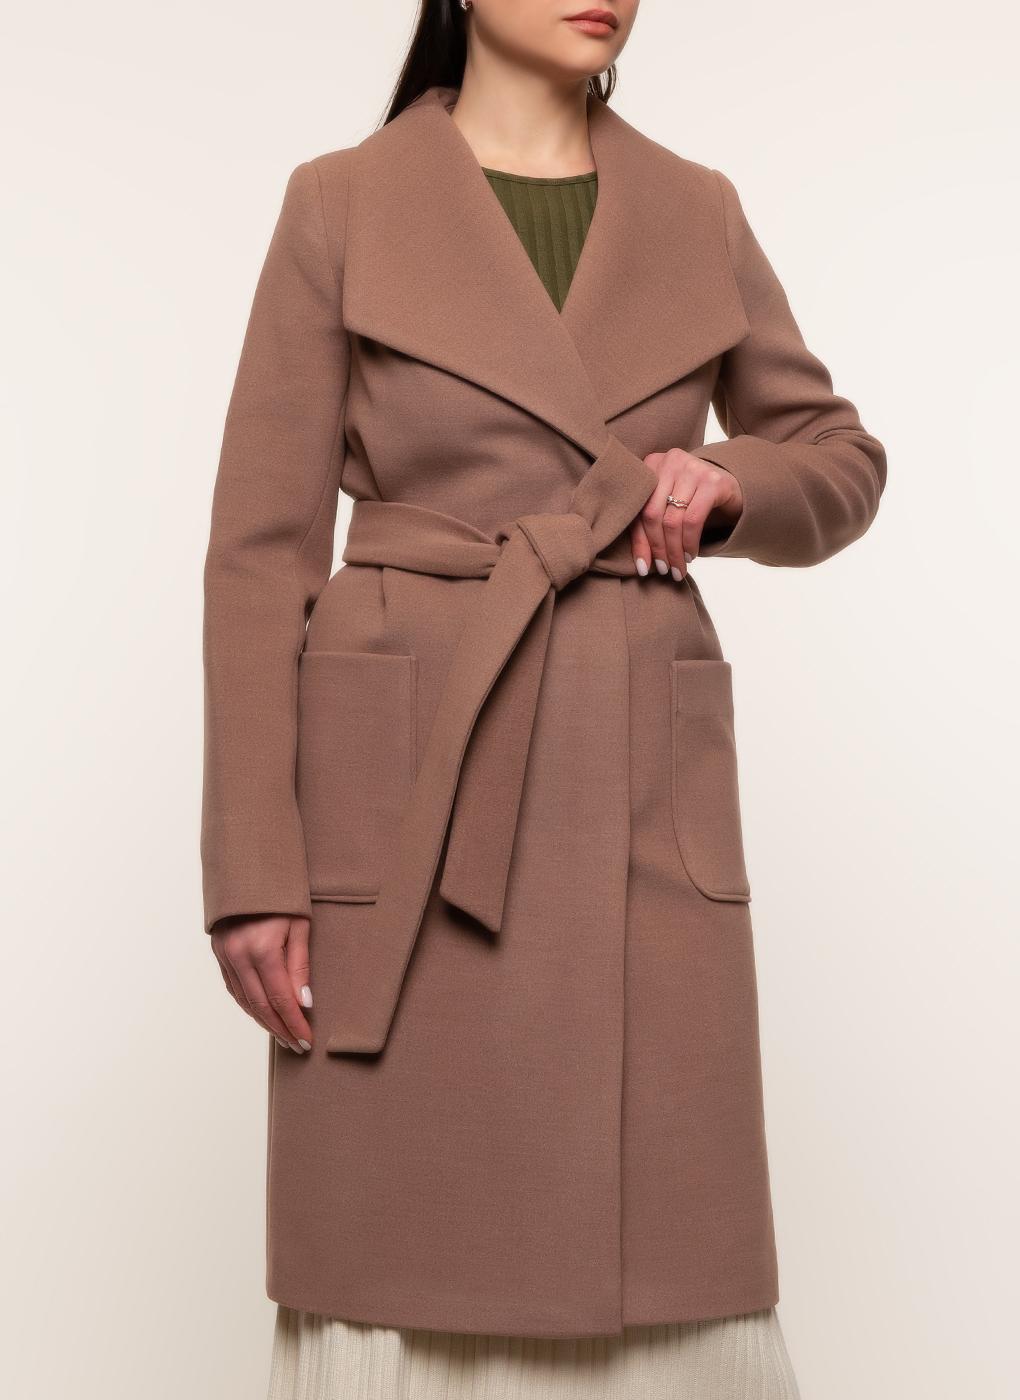 Пальто 15, Аллатекс фото